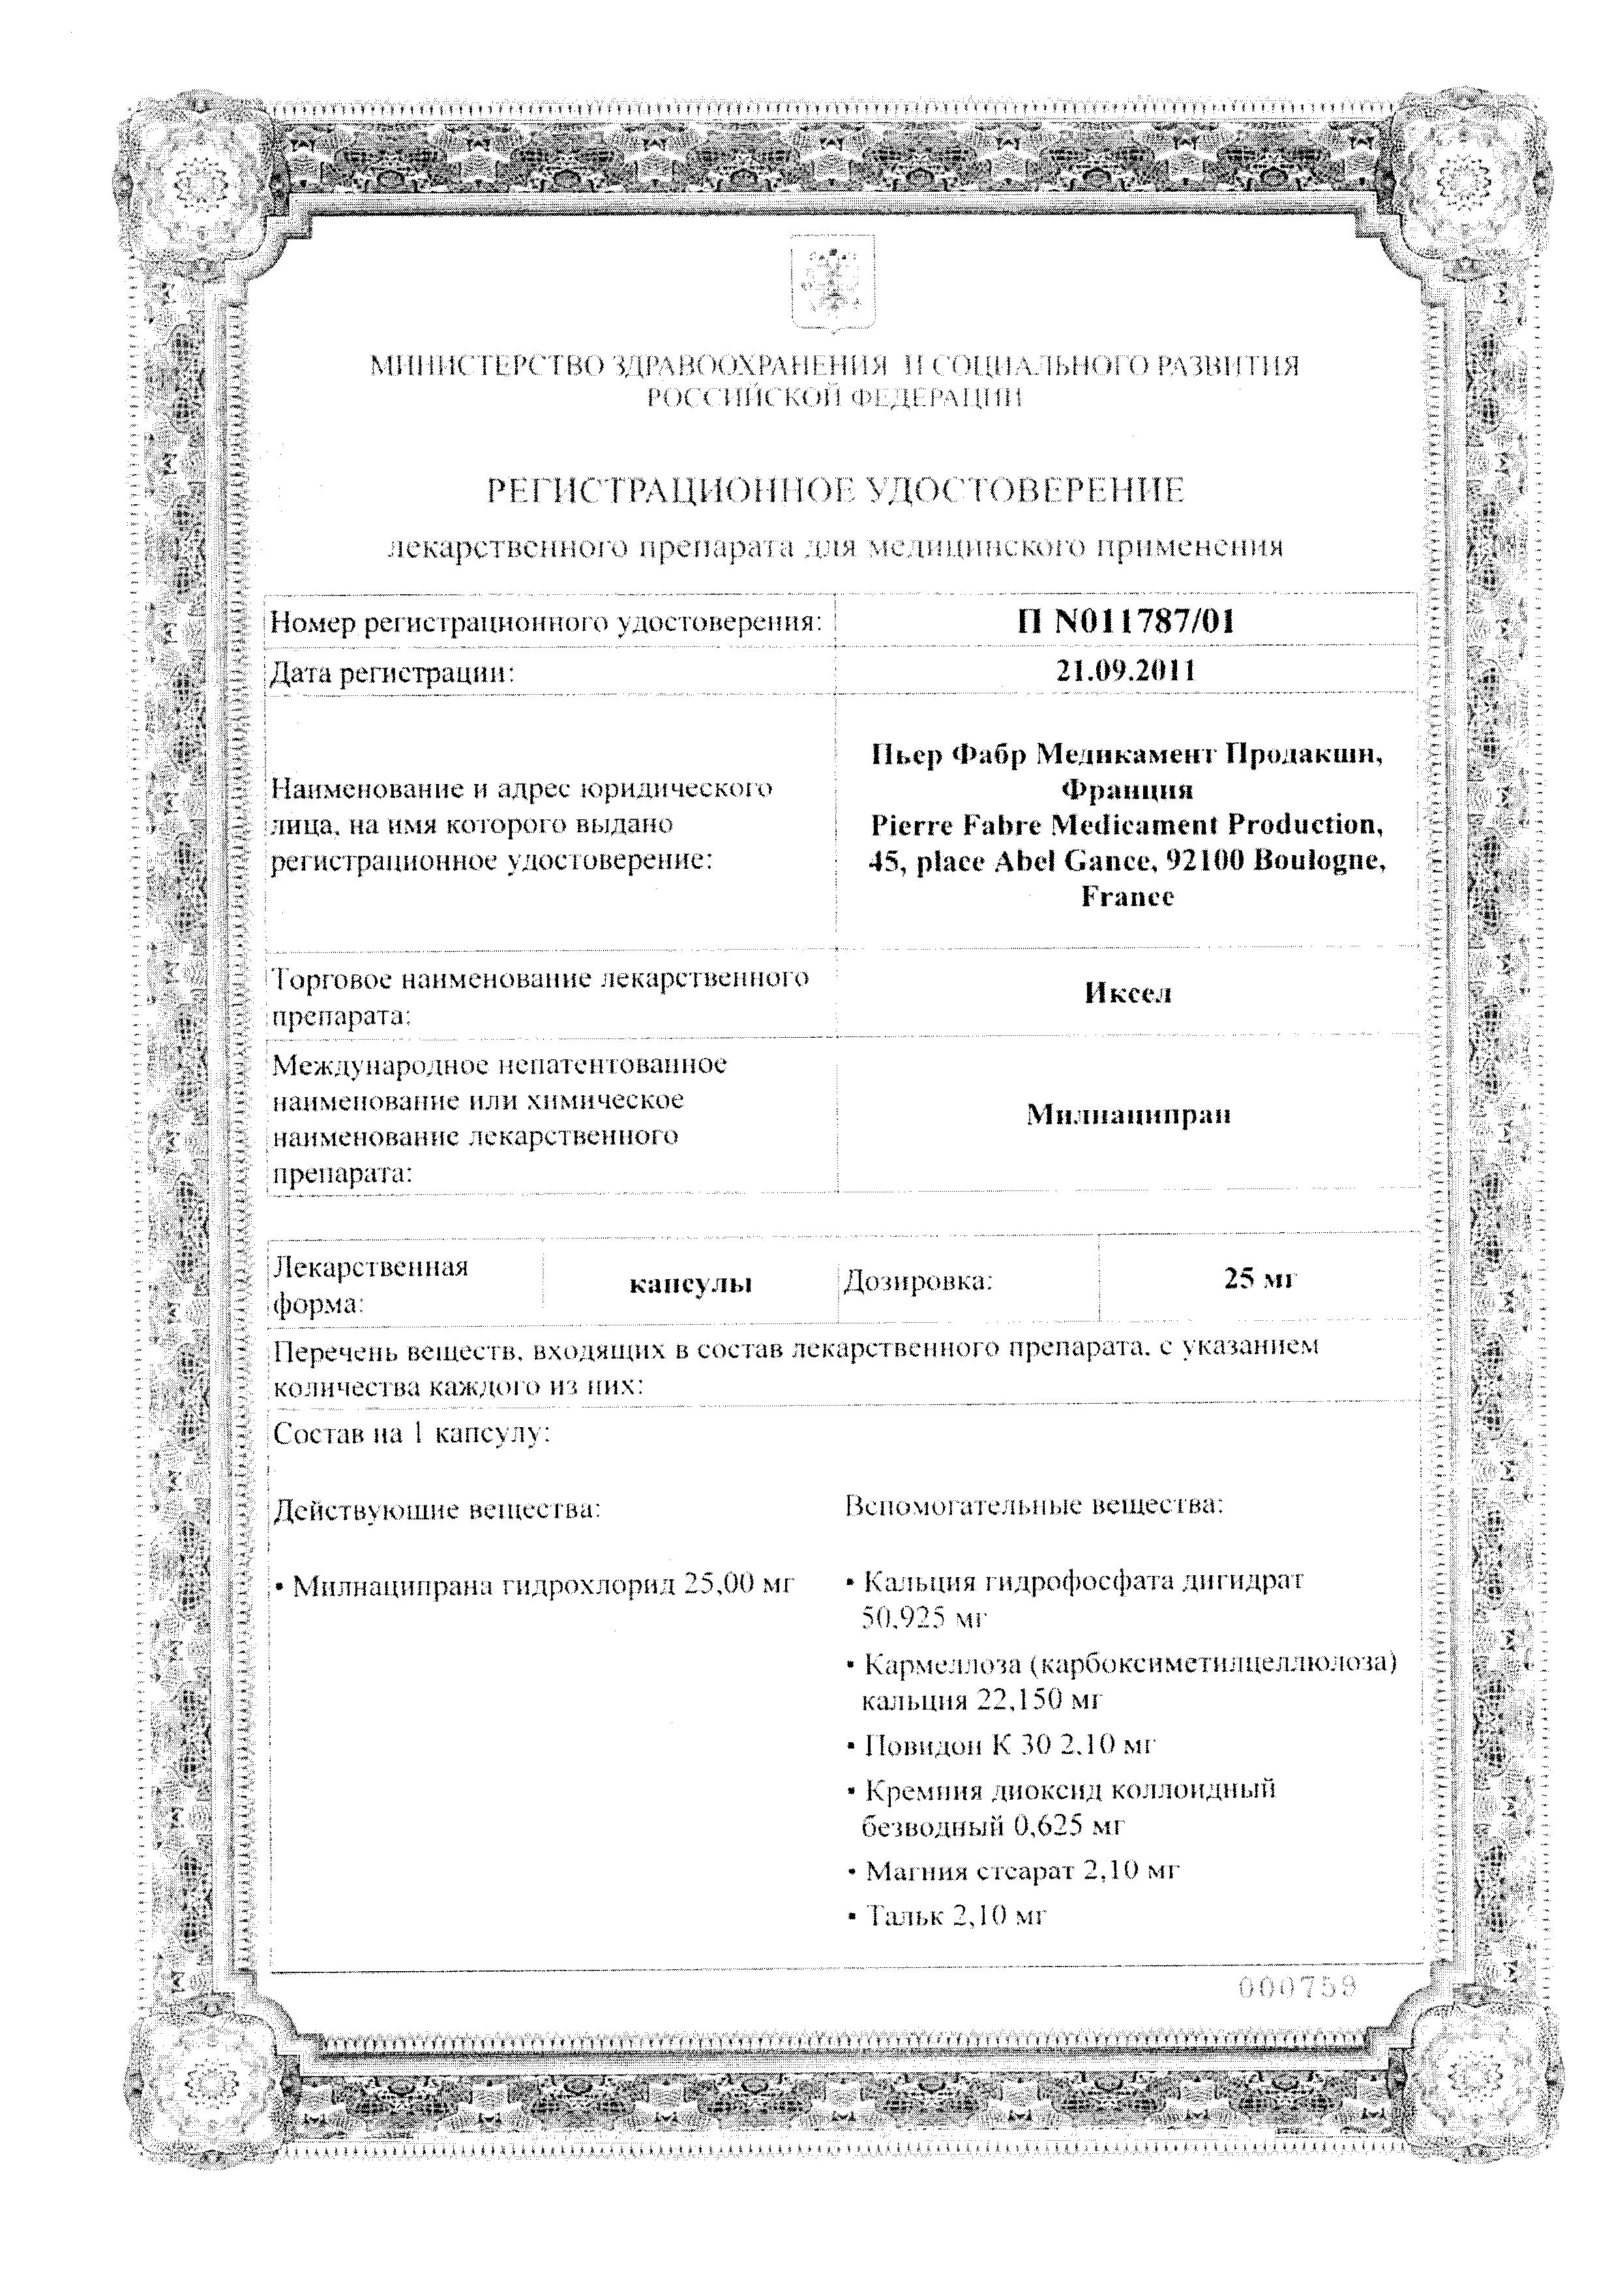 Иксел сертификат